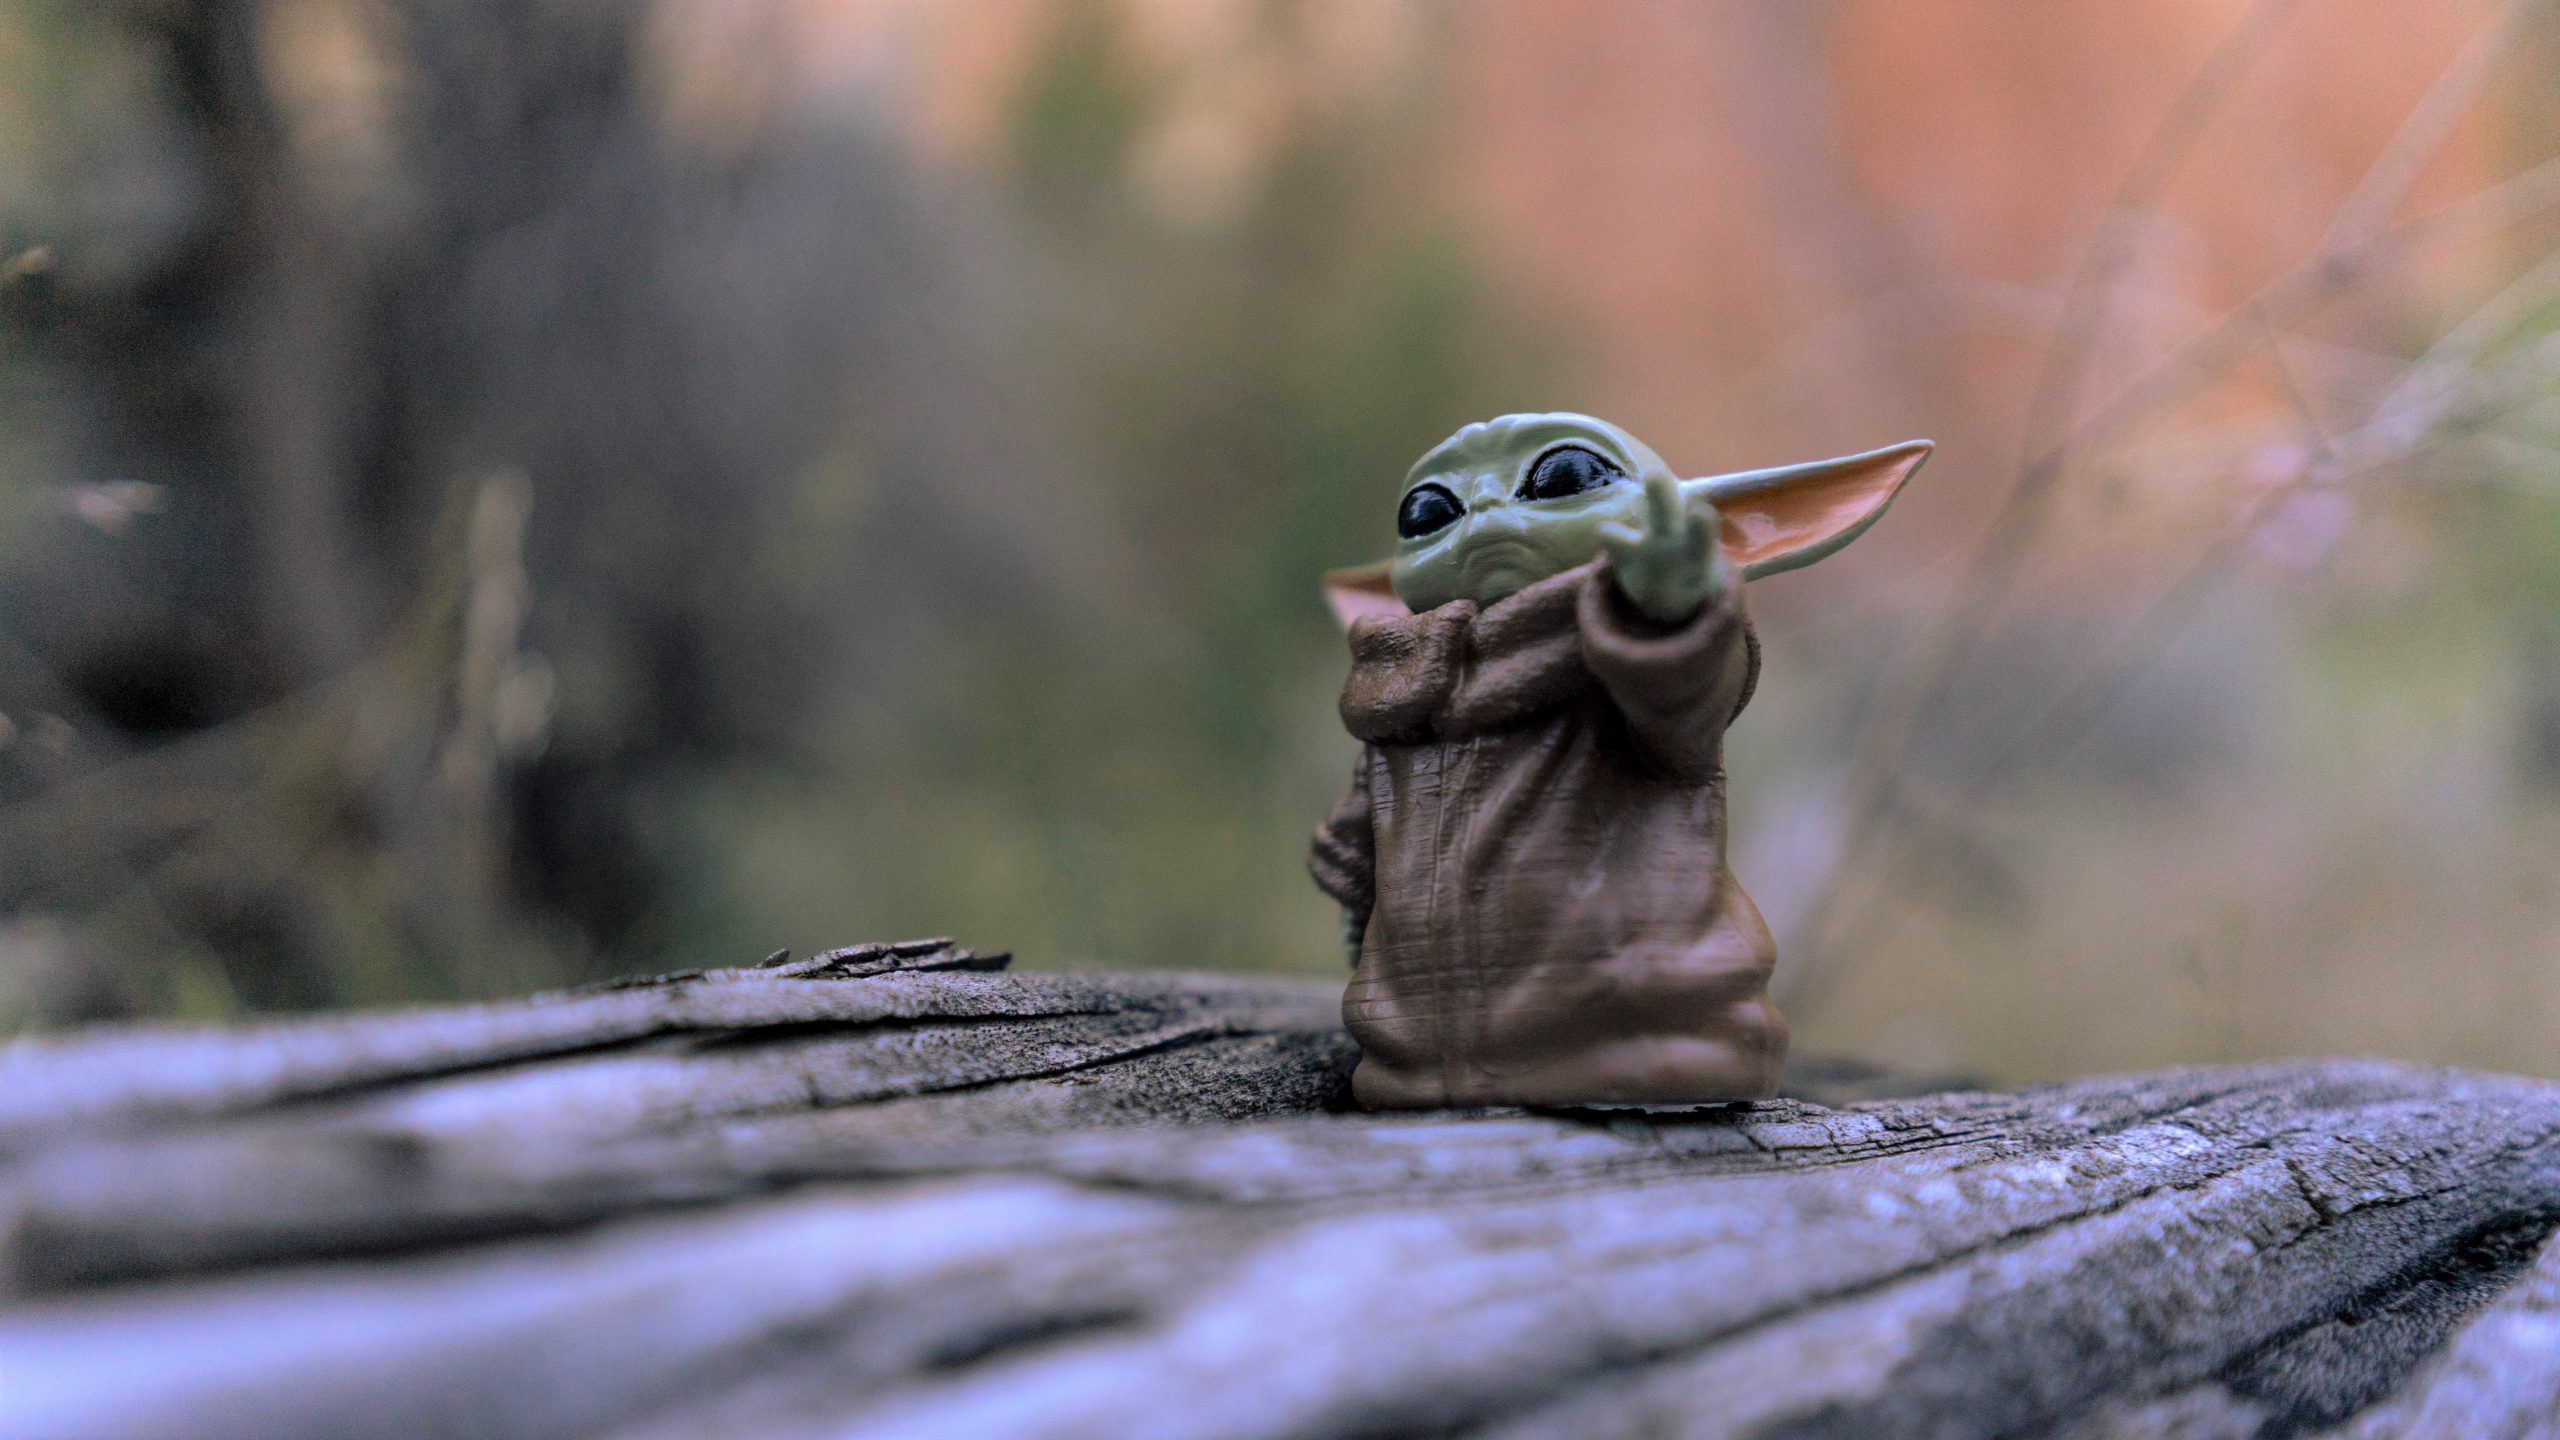 Image: Baby Yoda figurine